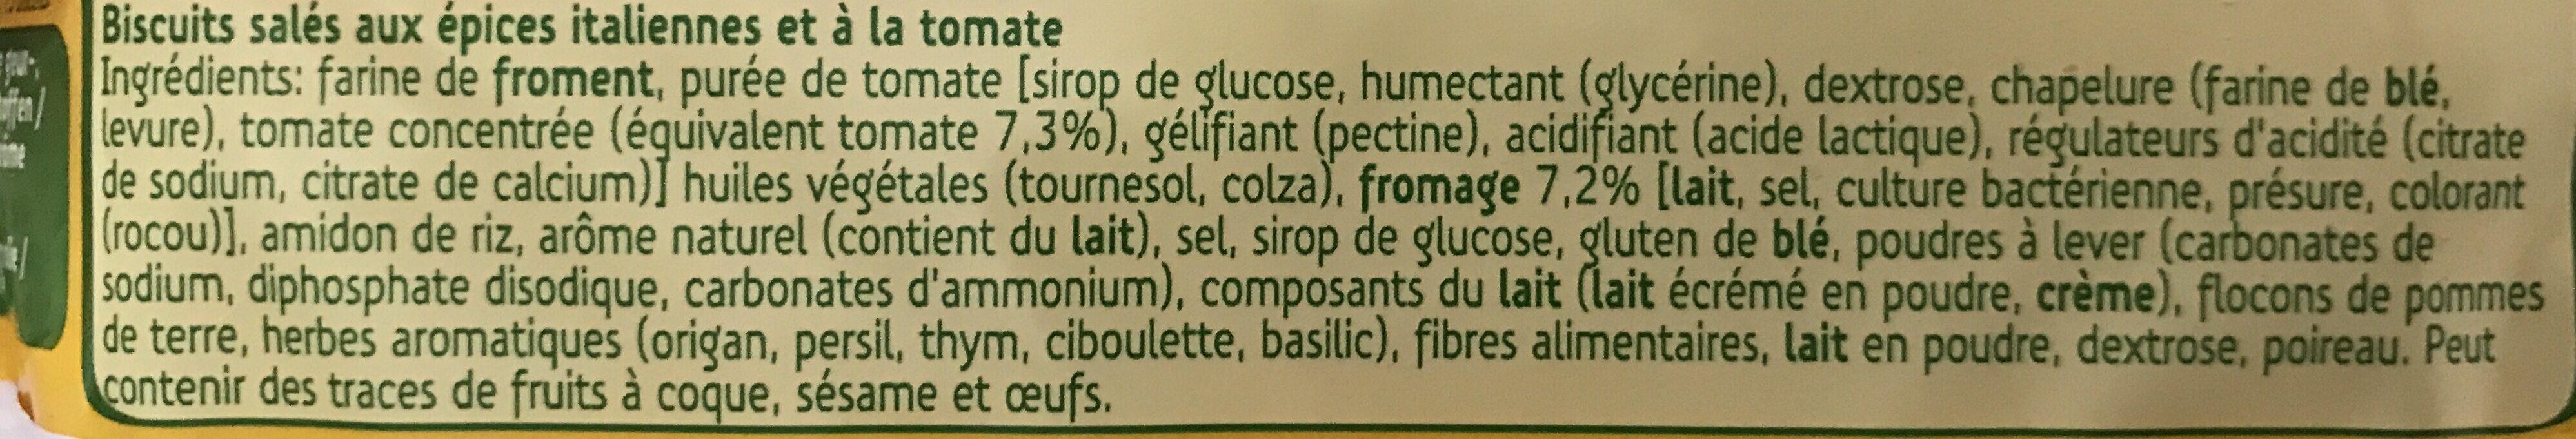 Galleta Salada Tom-italiana - Ingrédients - fr